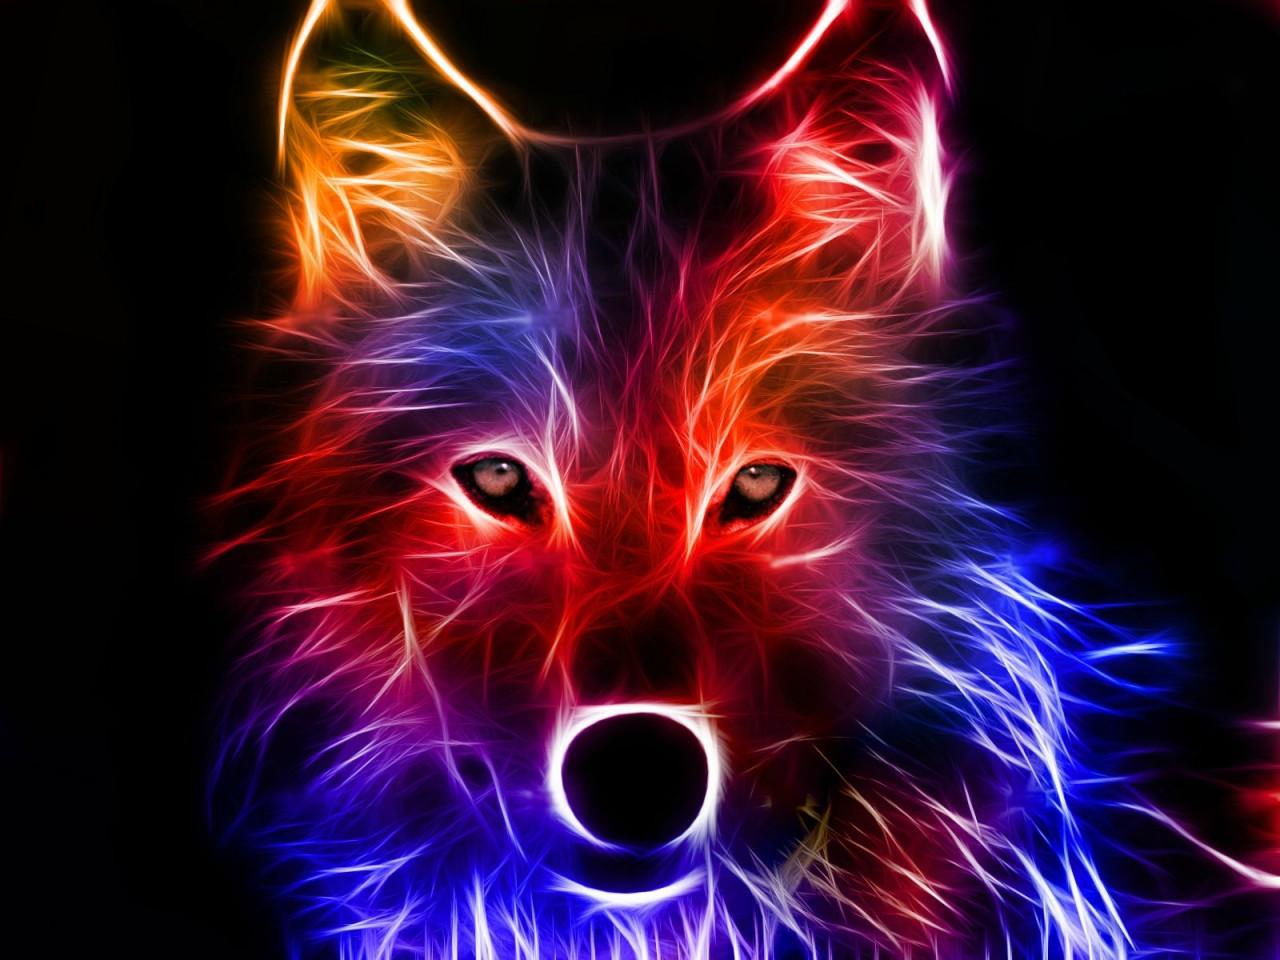 Light Effect Hd Wallpaper Background Images: Light Effect Wolf